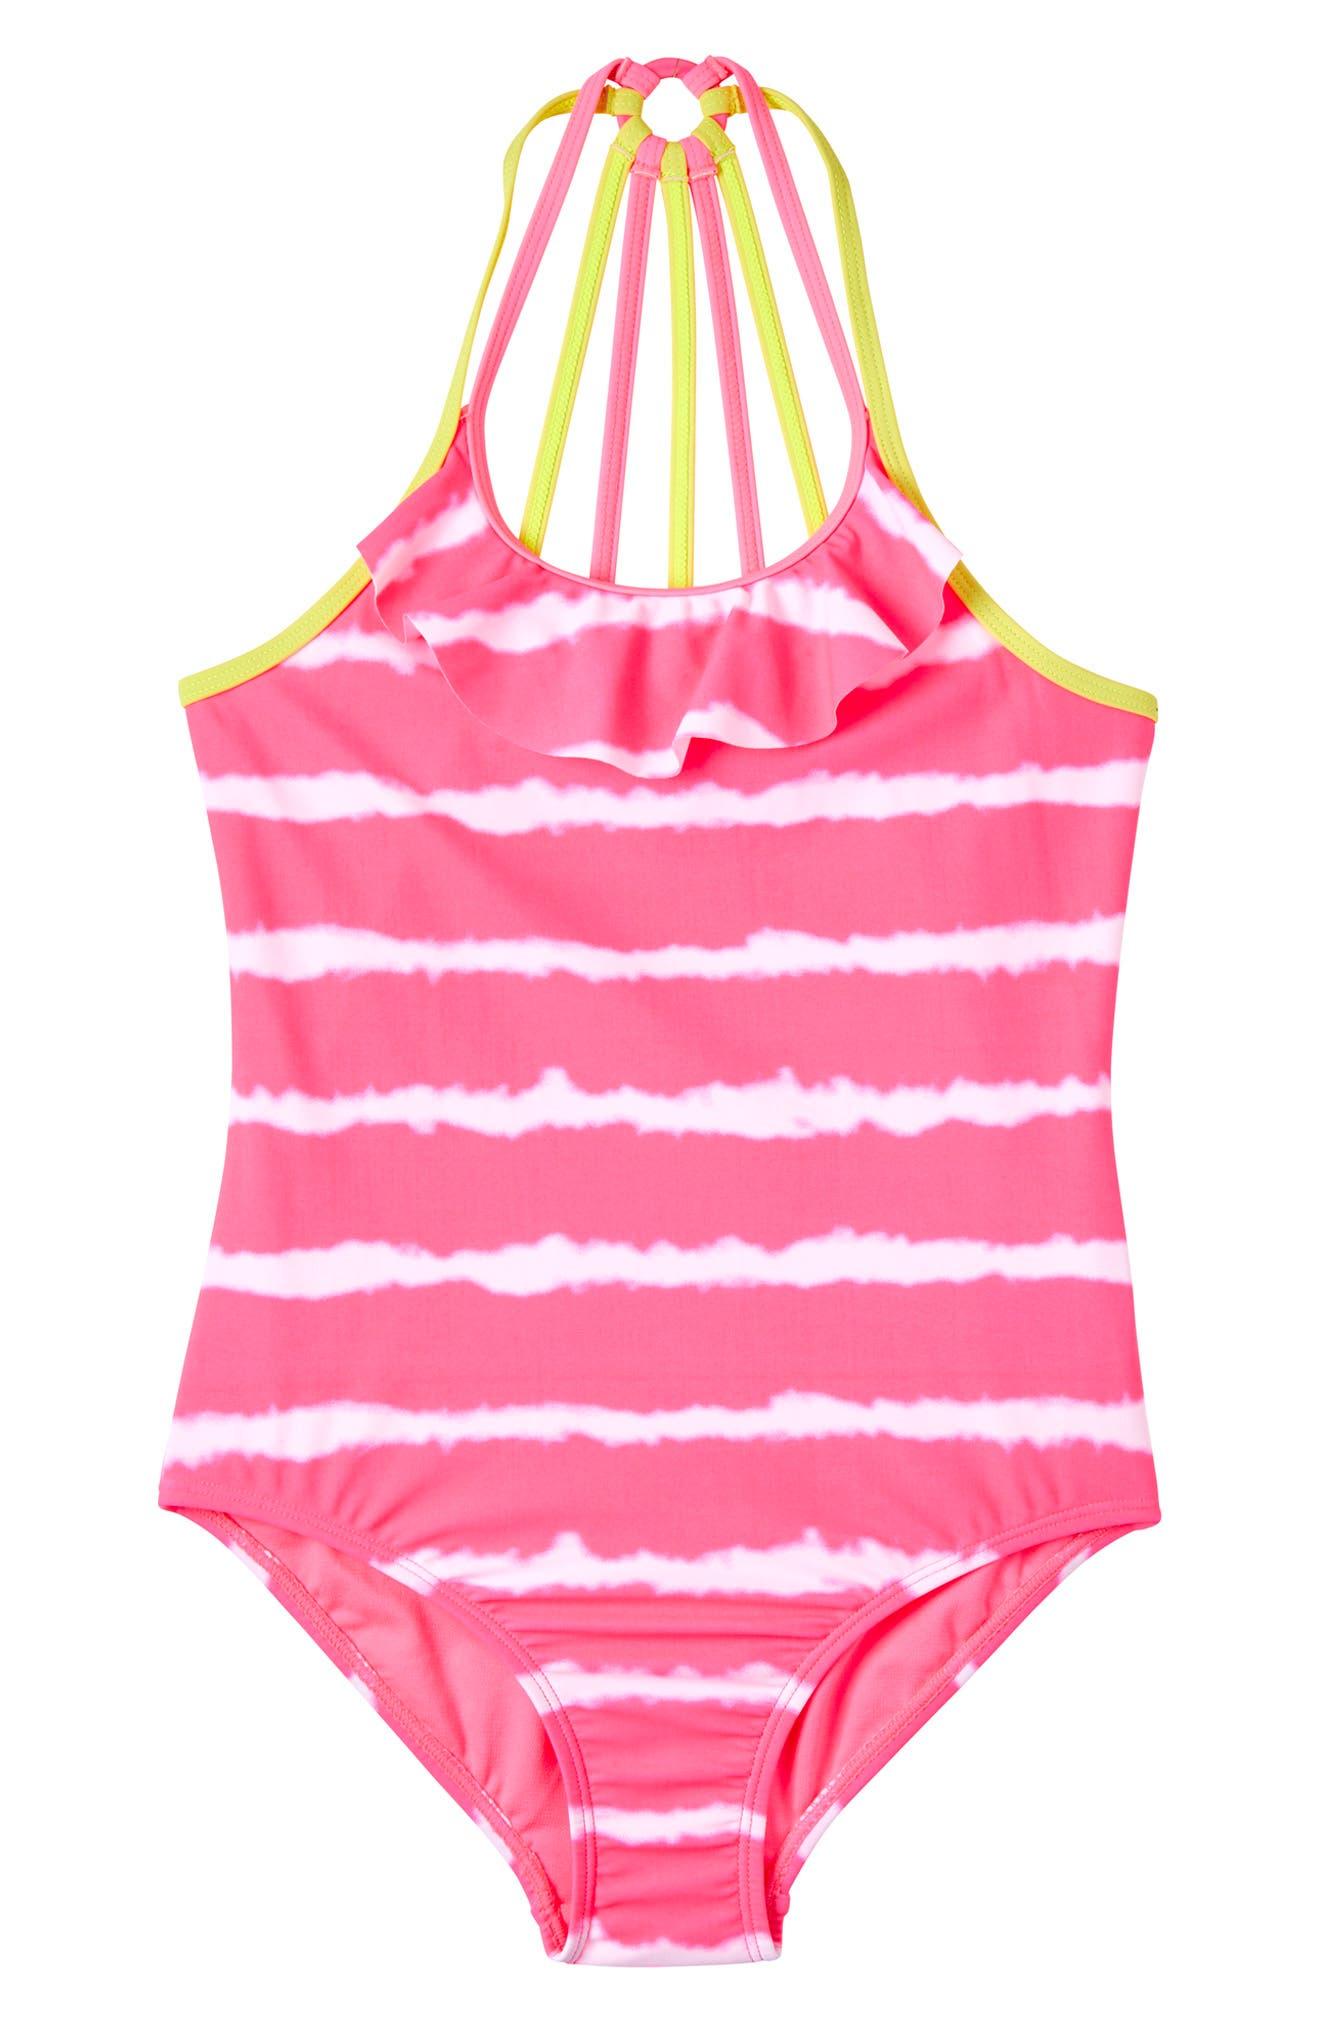 Kensie Girls Outerwear Baby Kensie Seersucker Stripe Ruffle Trim One-Piece Swimsuit